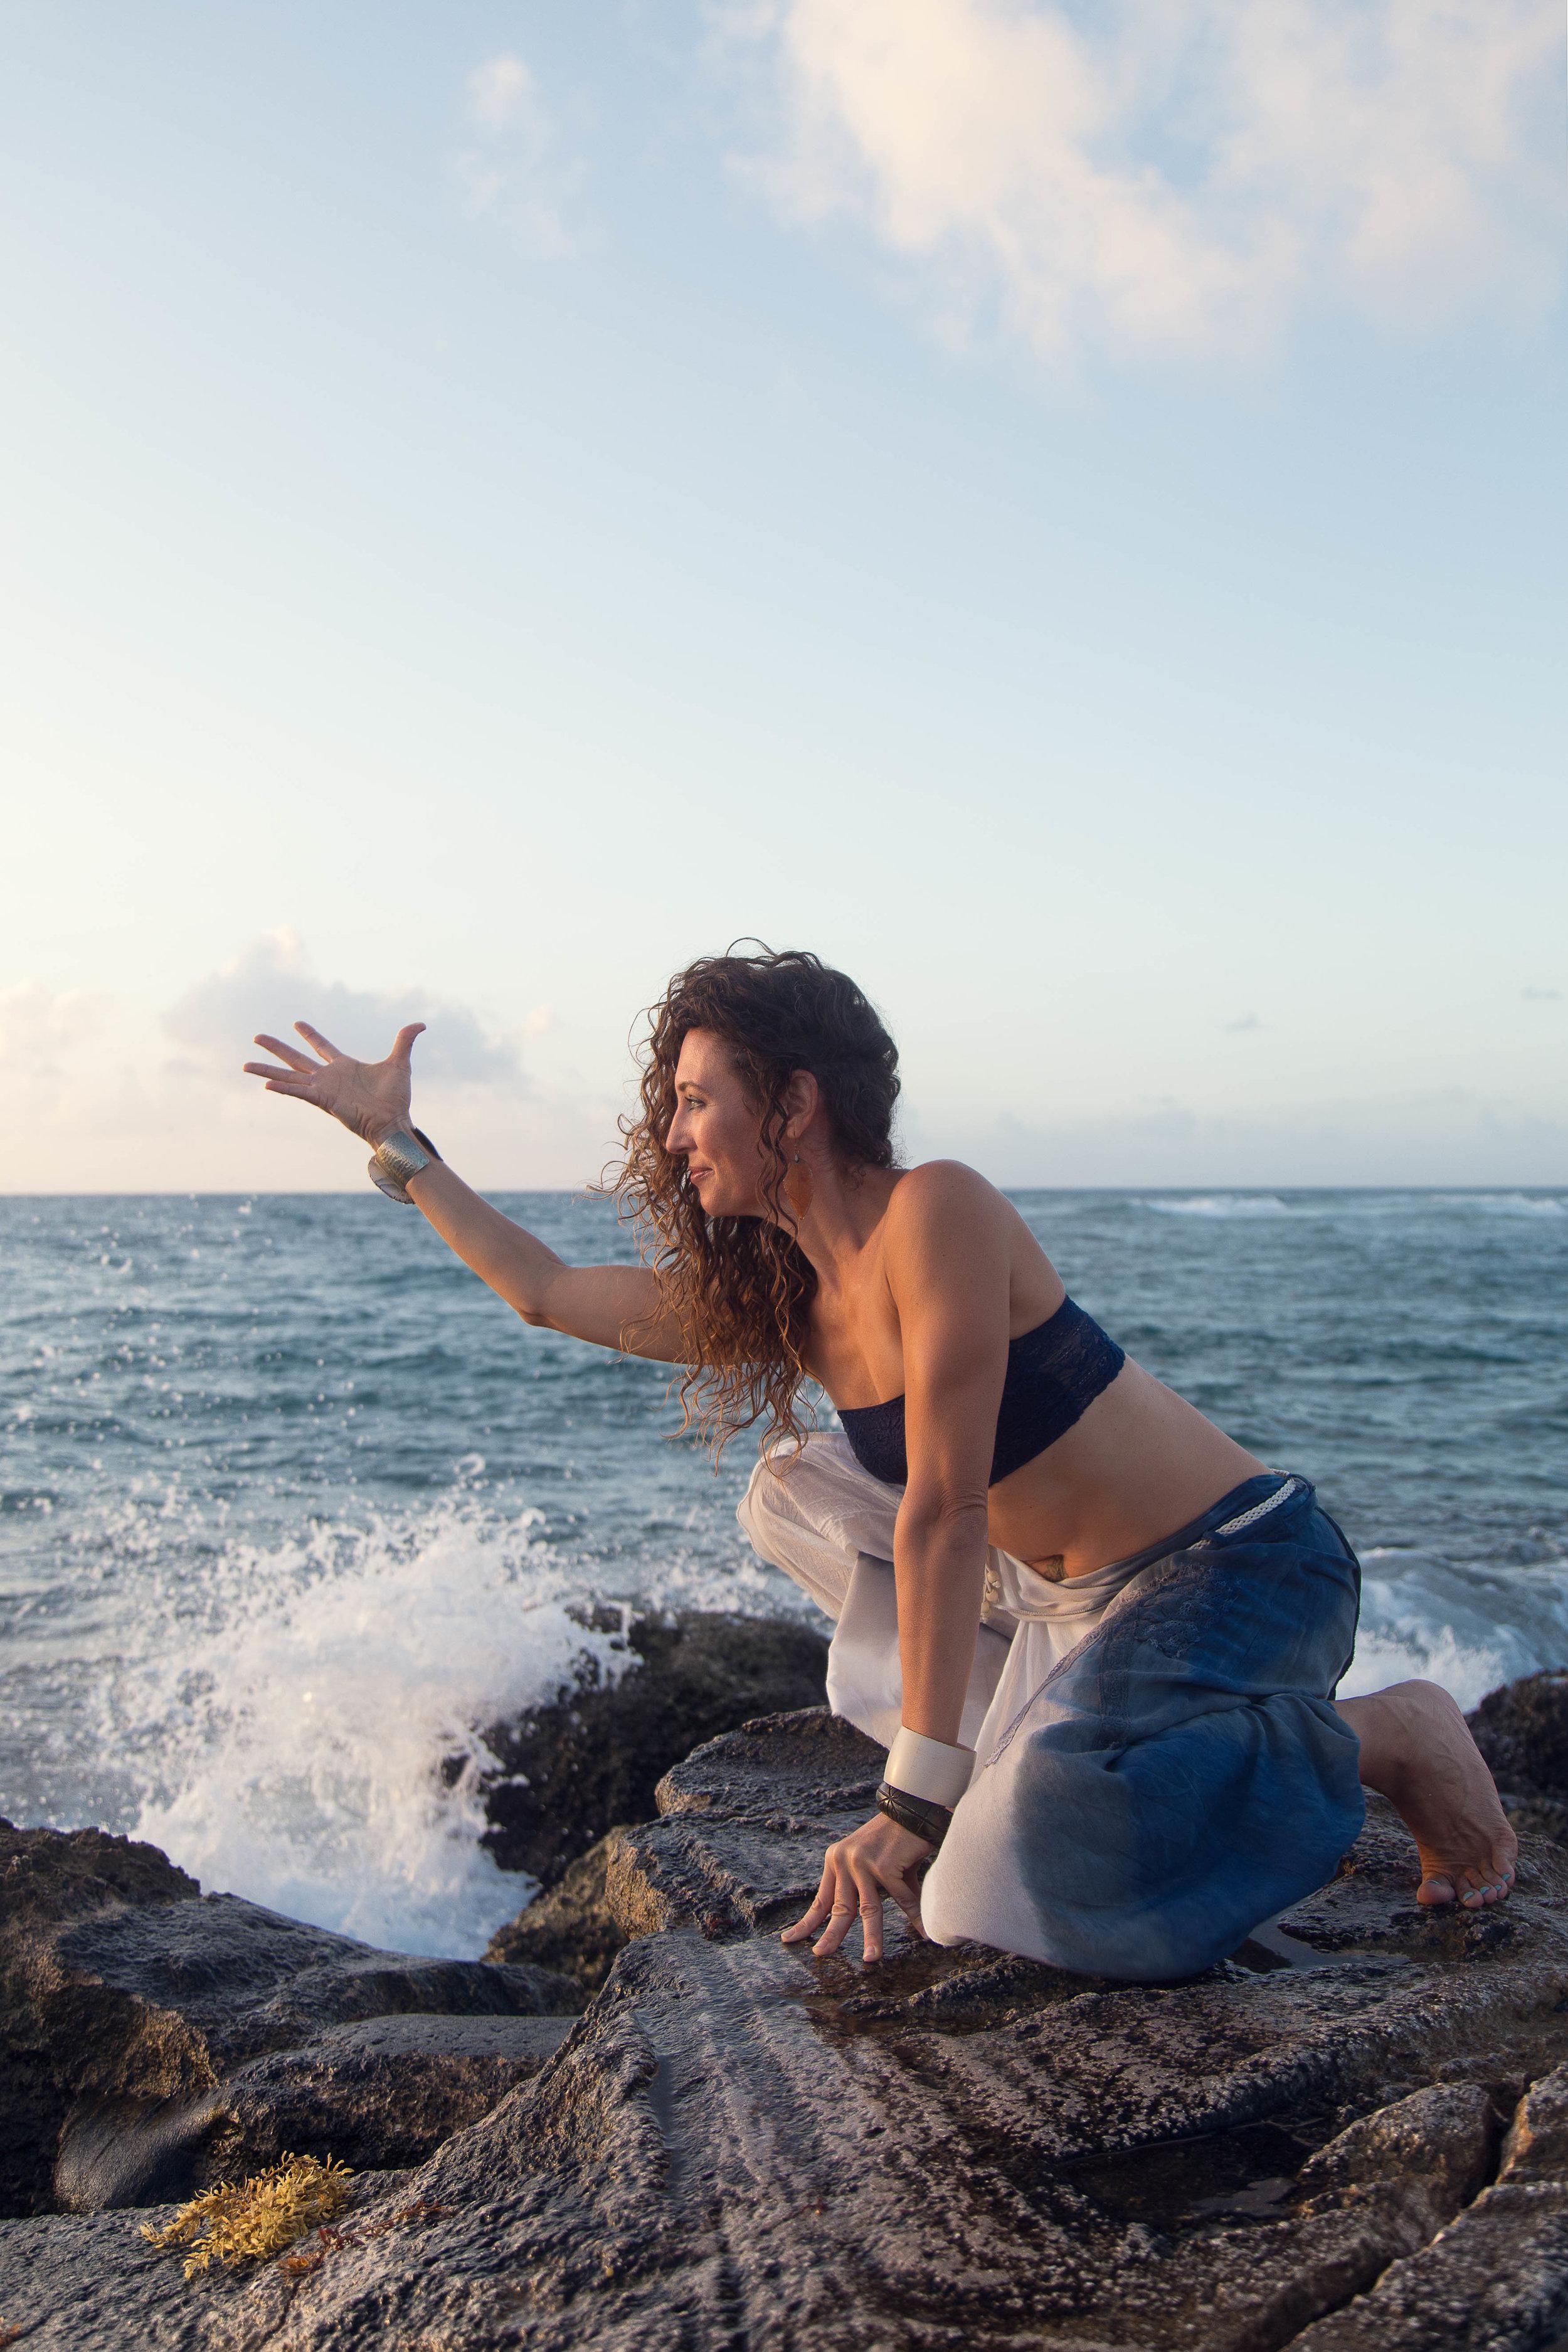 beach-waves-goddess-florida.jpg